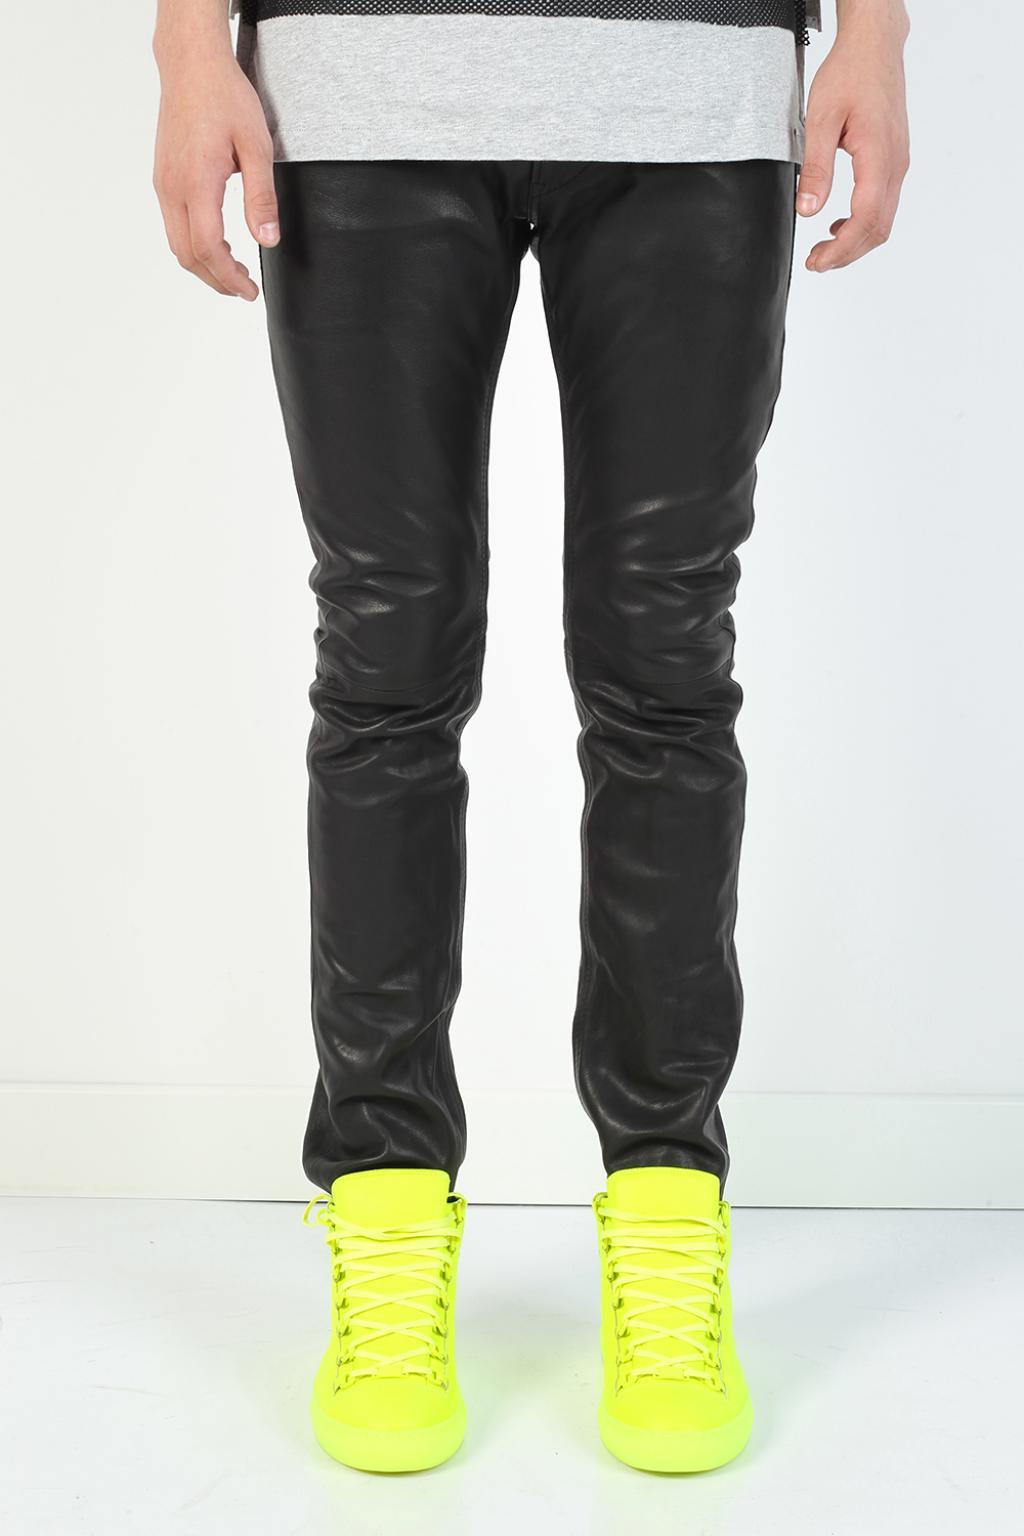 6995fab5 DIESEL - Black 'thavar' Leather Trousers for Men - Lyst. View fullscreen